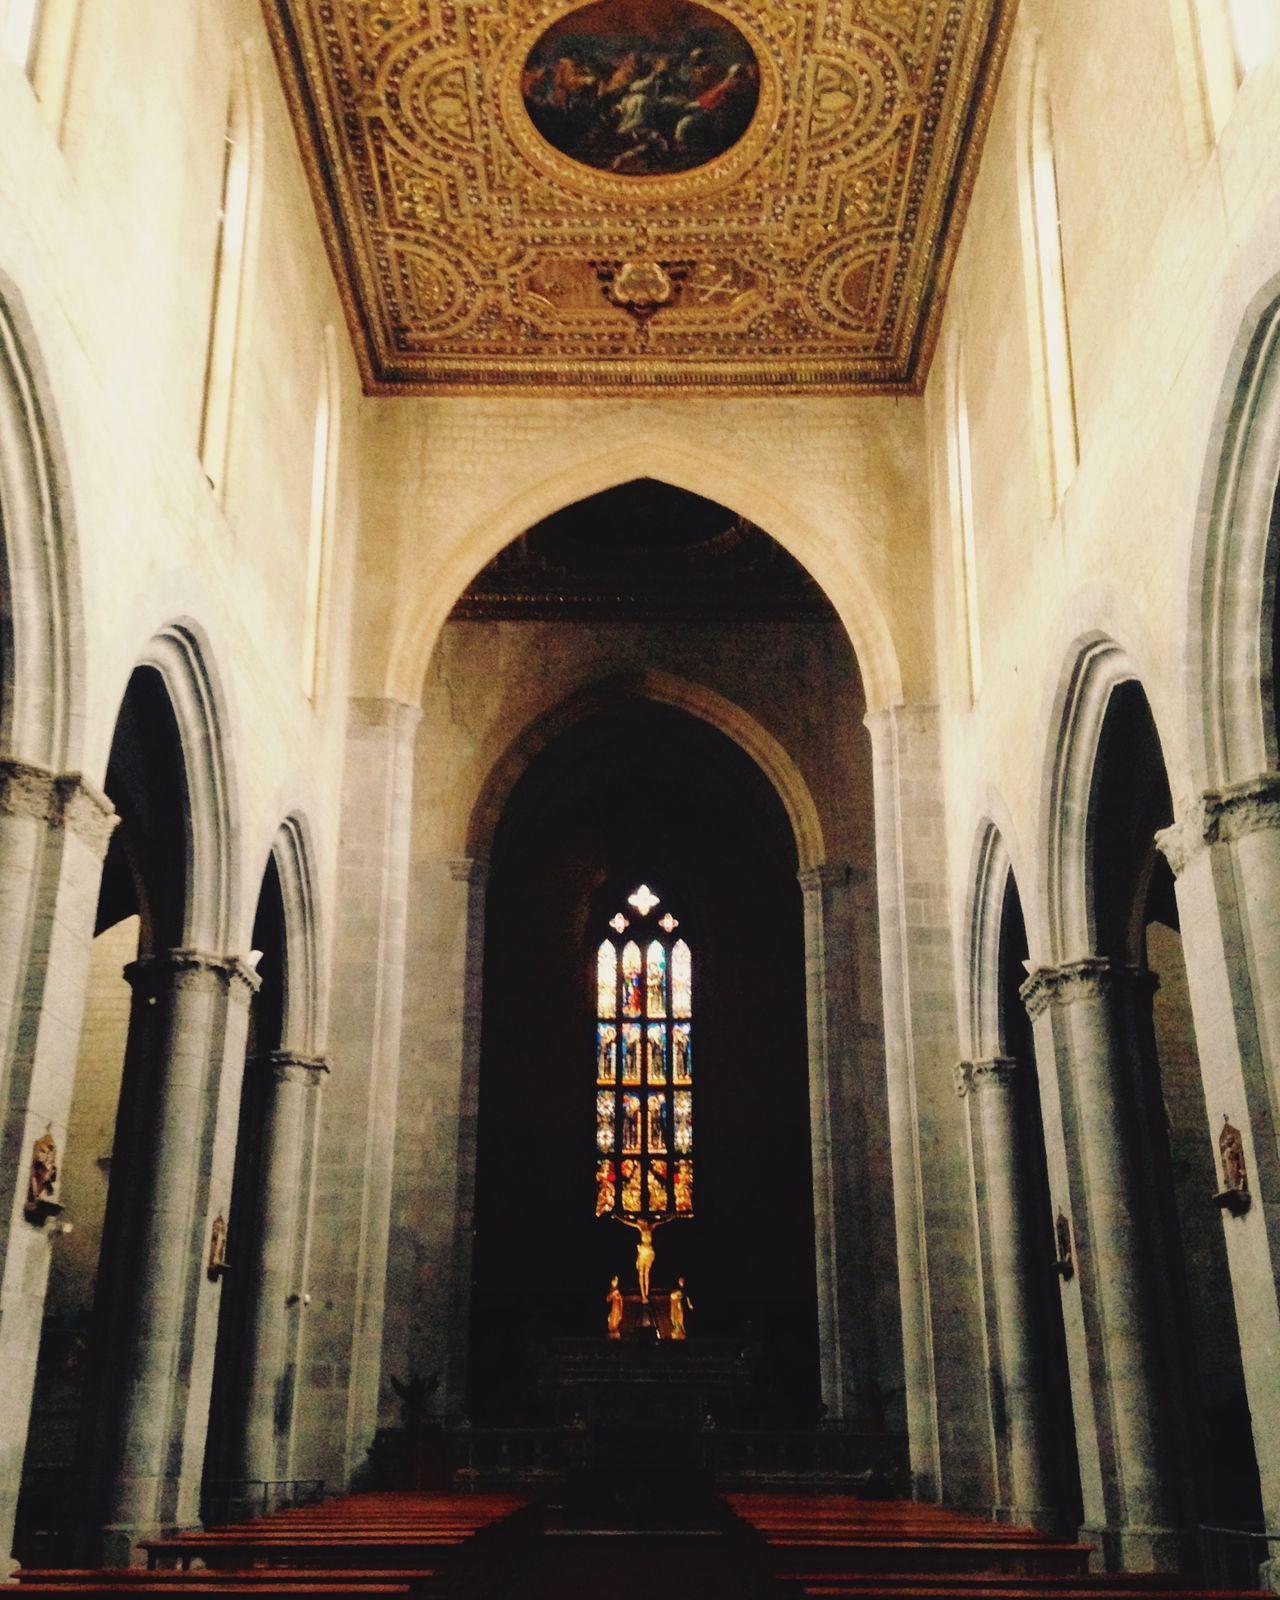 Chiesa di San Pietro a Majella. Arte Architettura Religion Place Of Worship Arch Indoors  Low Angle View Architecture Day Siituristadellatuacittá Naples